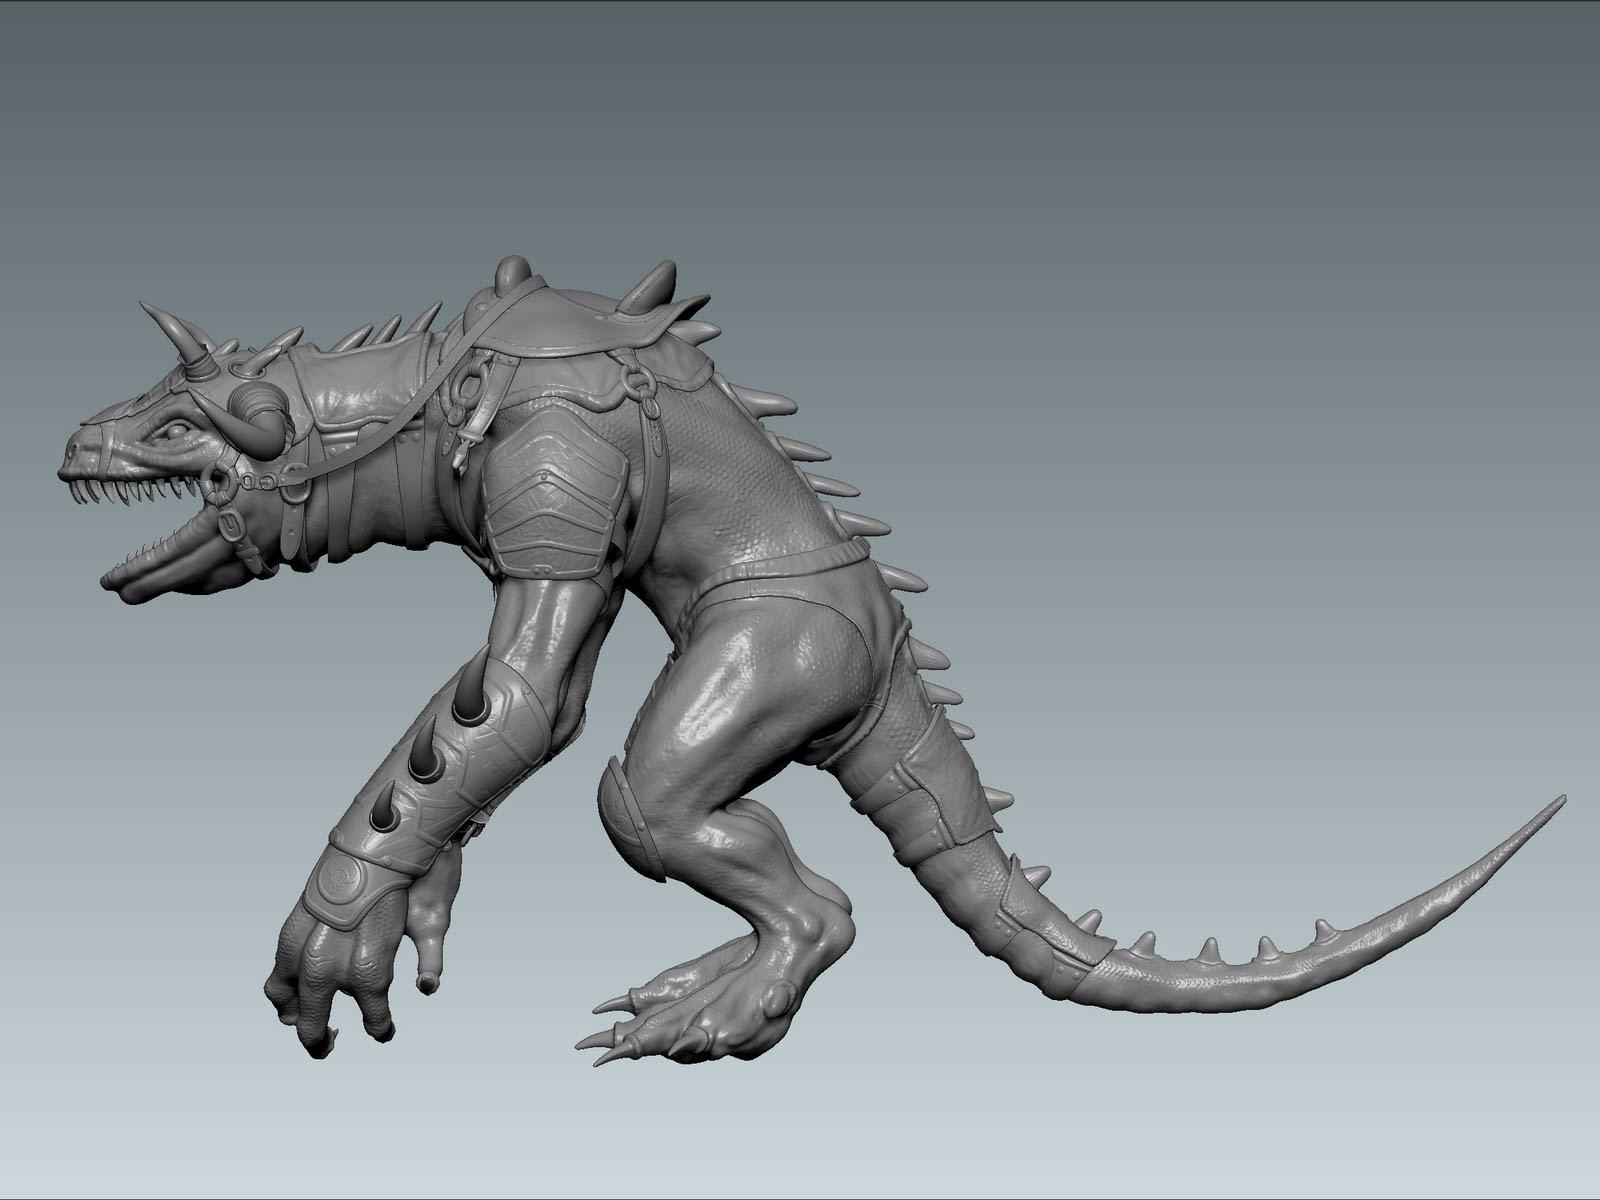 huan phan Dragon Viking High Res Zbrush Model